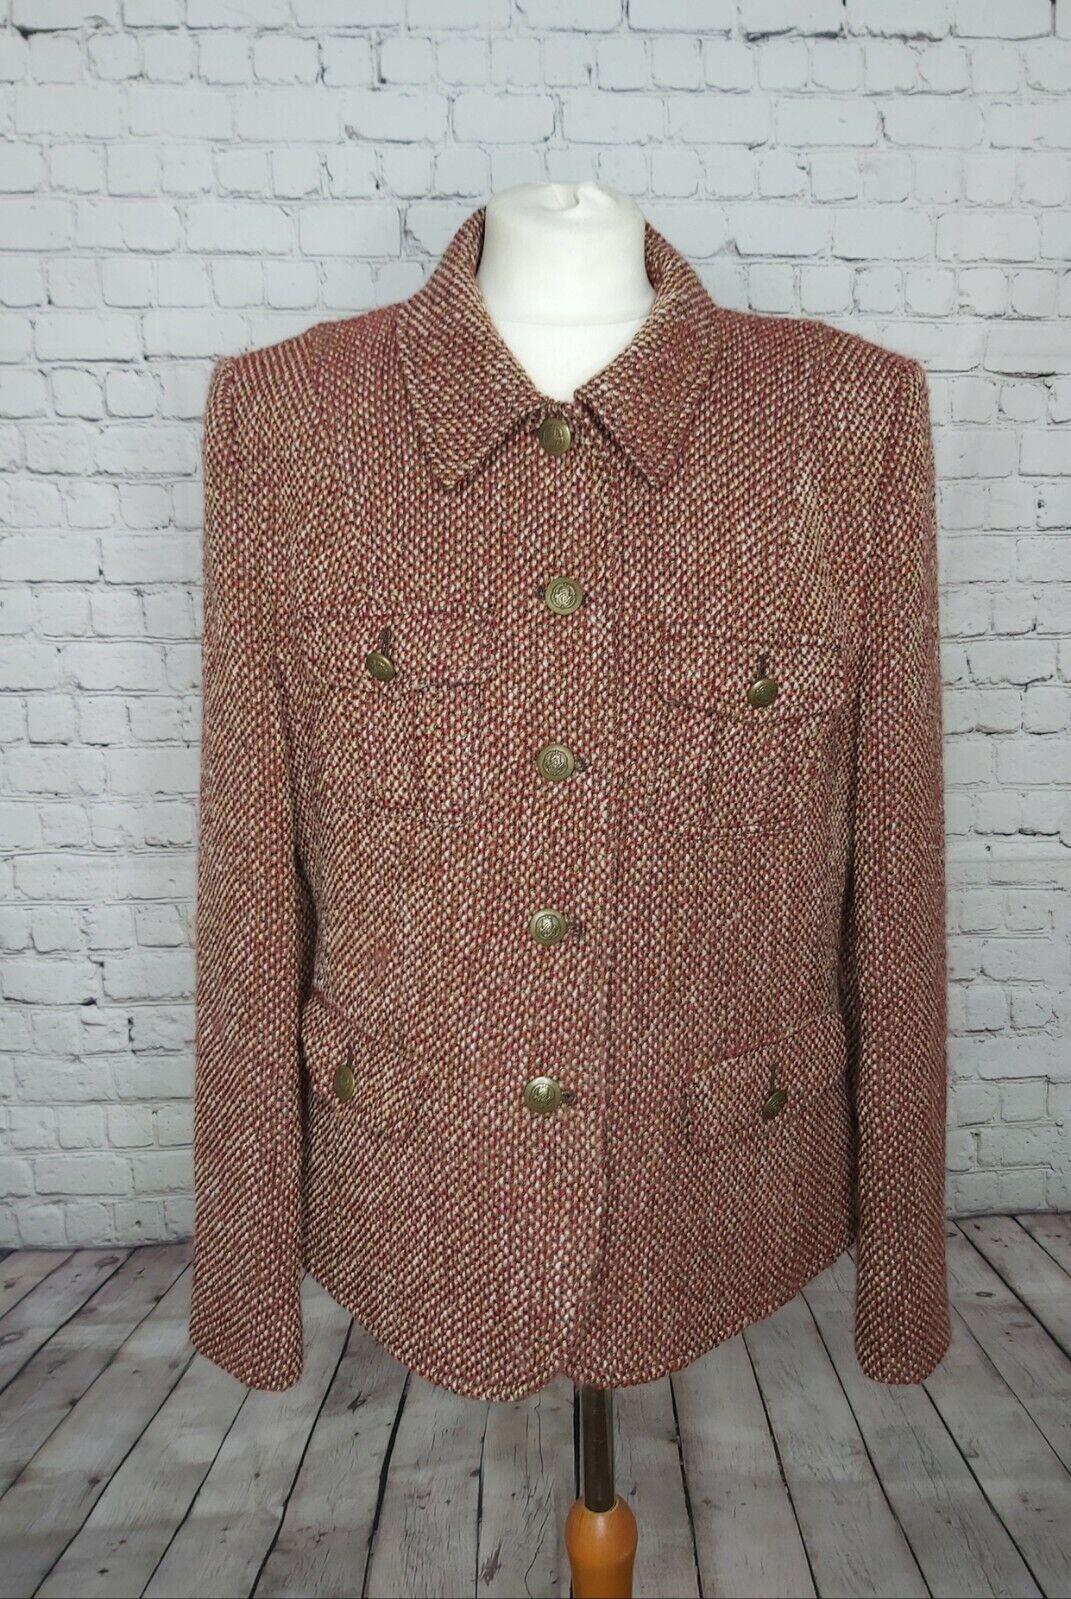 BASLER UK16 Virgin Wool Tweed Boucle Style Burnt Orange Cream Country Day Jacket